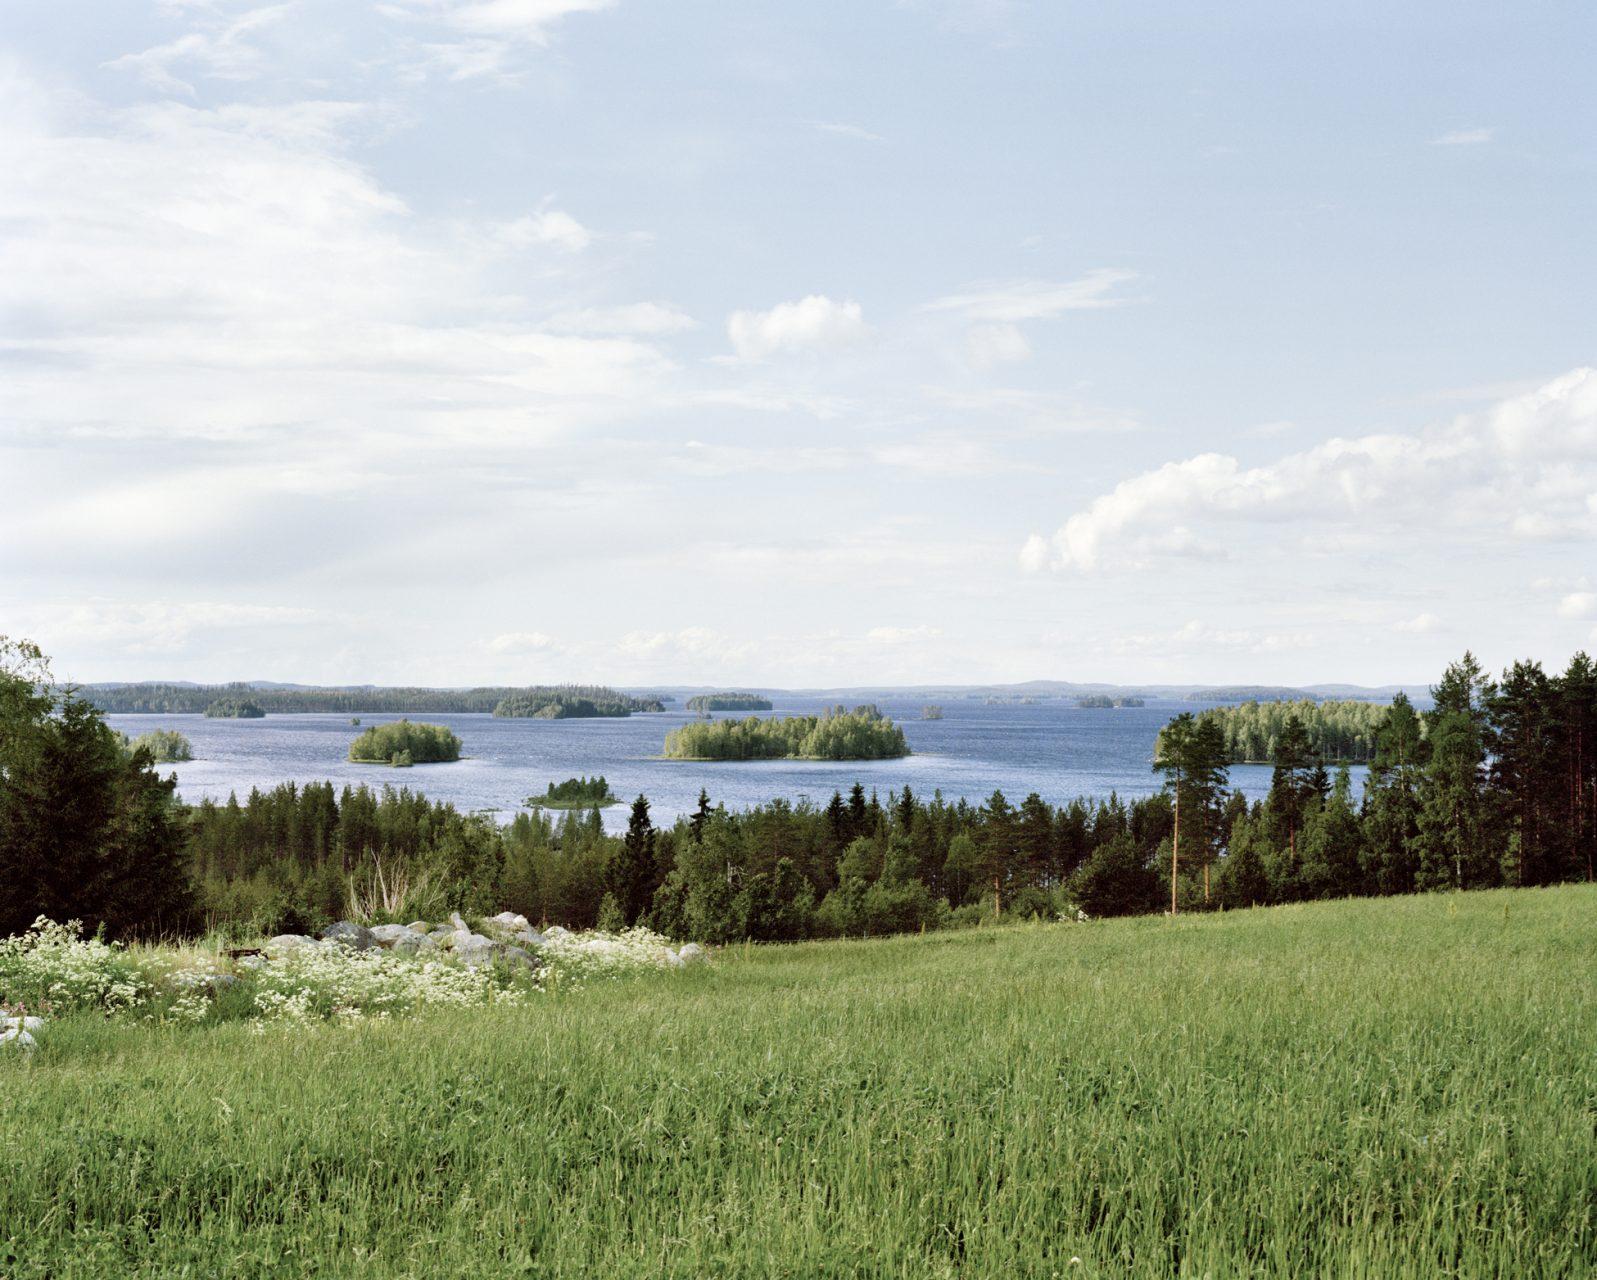 Kasaniya (Tracks), c-print, 100x120, 2013 / Finland, North Karelia, the outskirts of Ilomantsi. Lake Siitari. The place connected with the rune singer Mateli Kuivalatar.